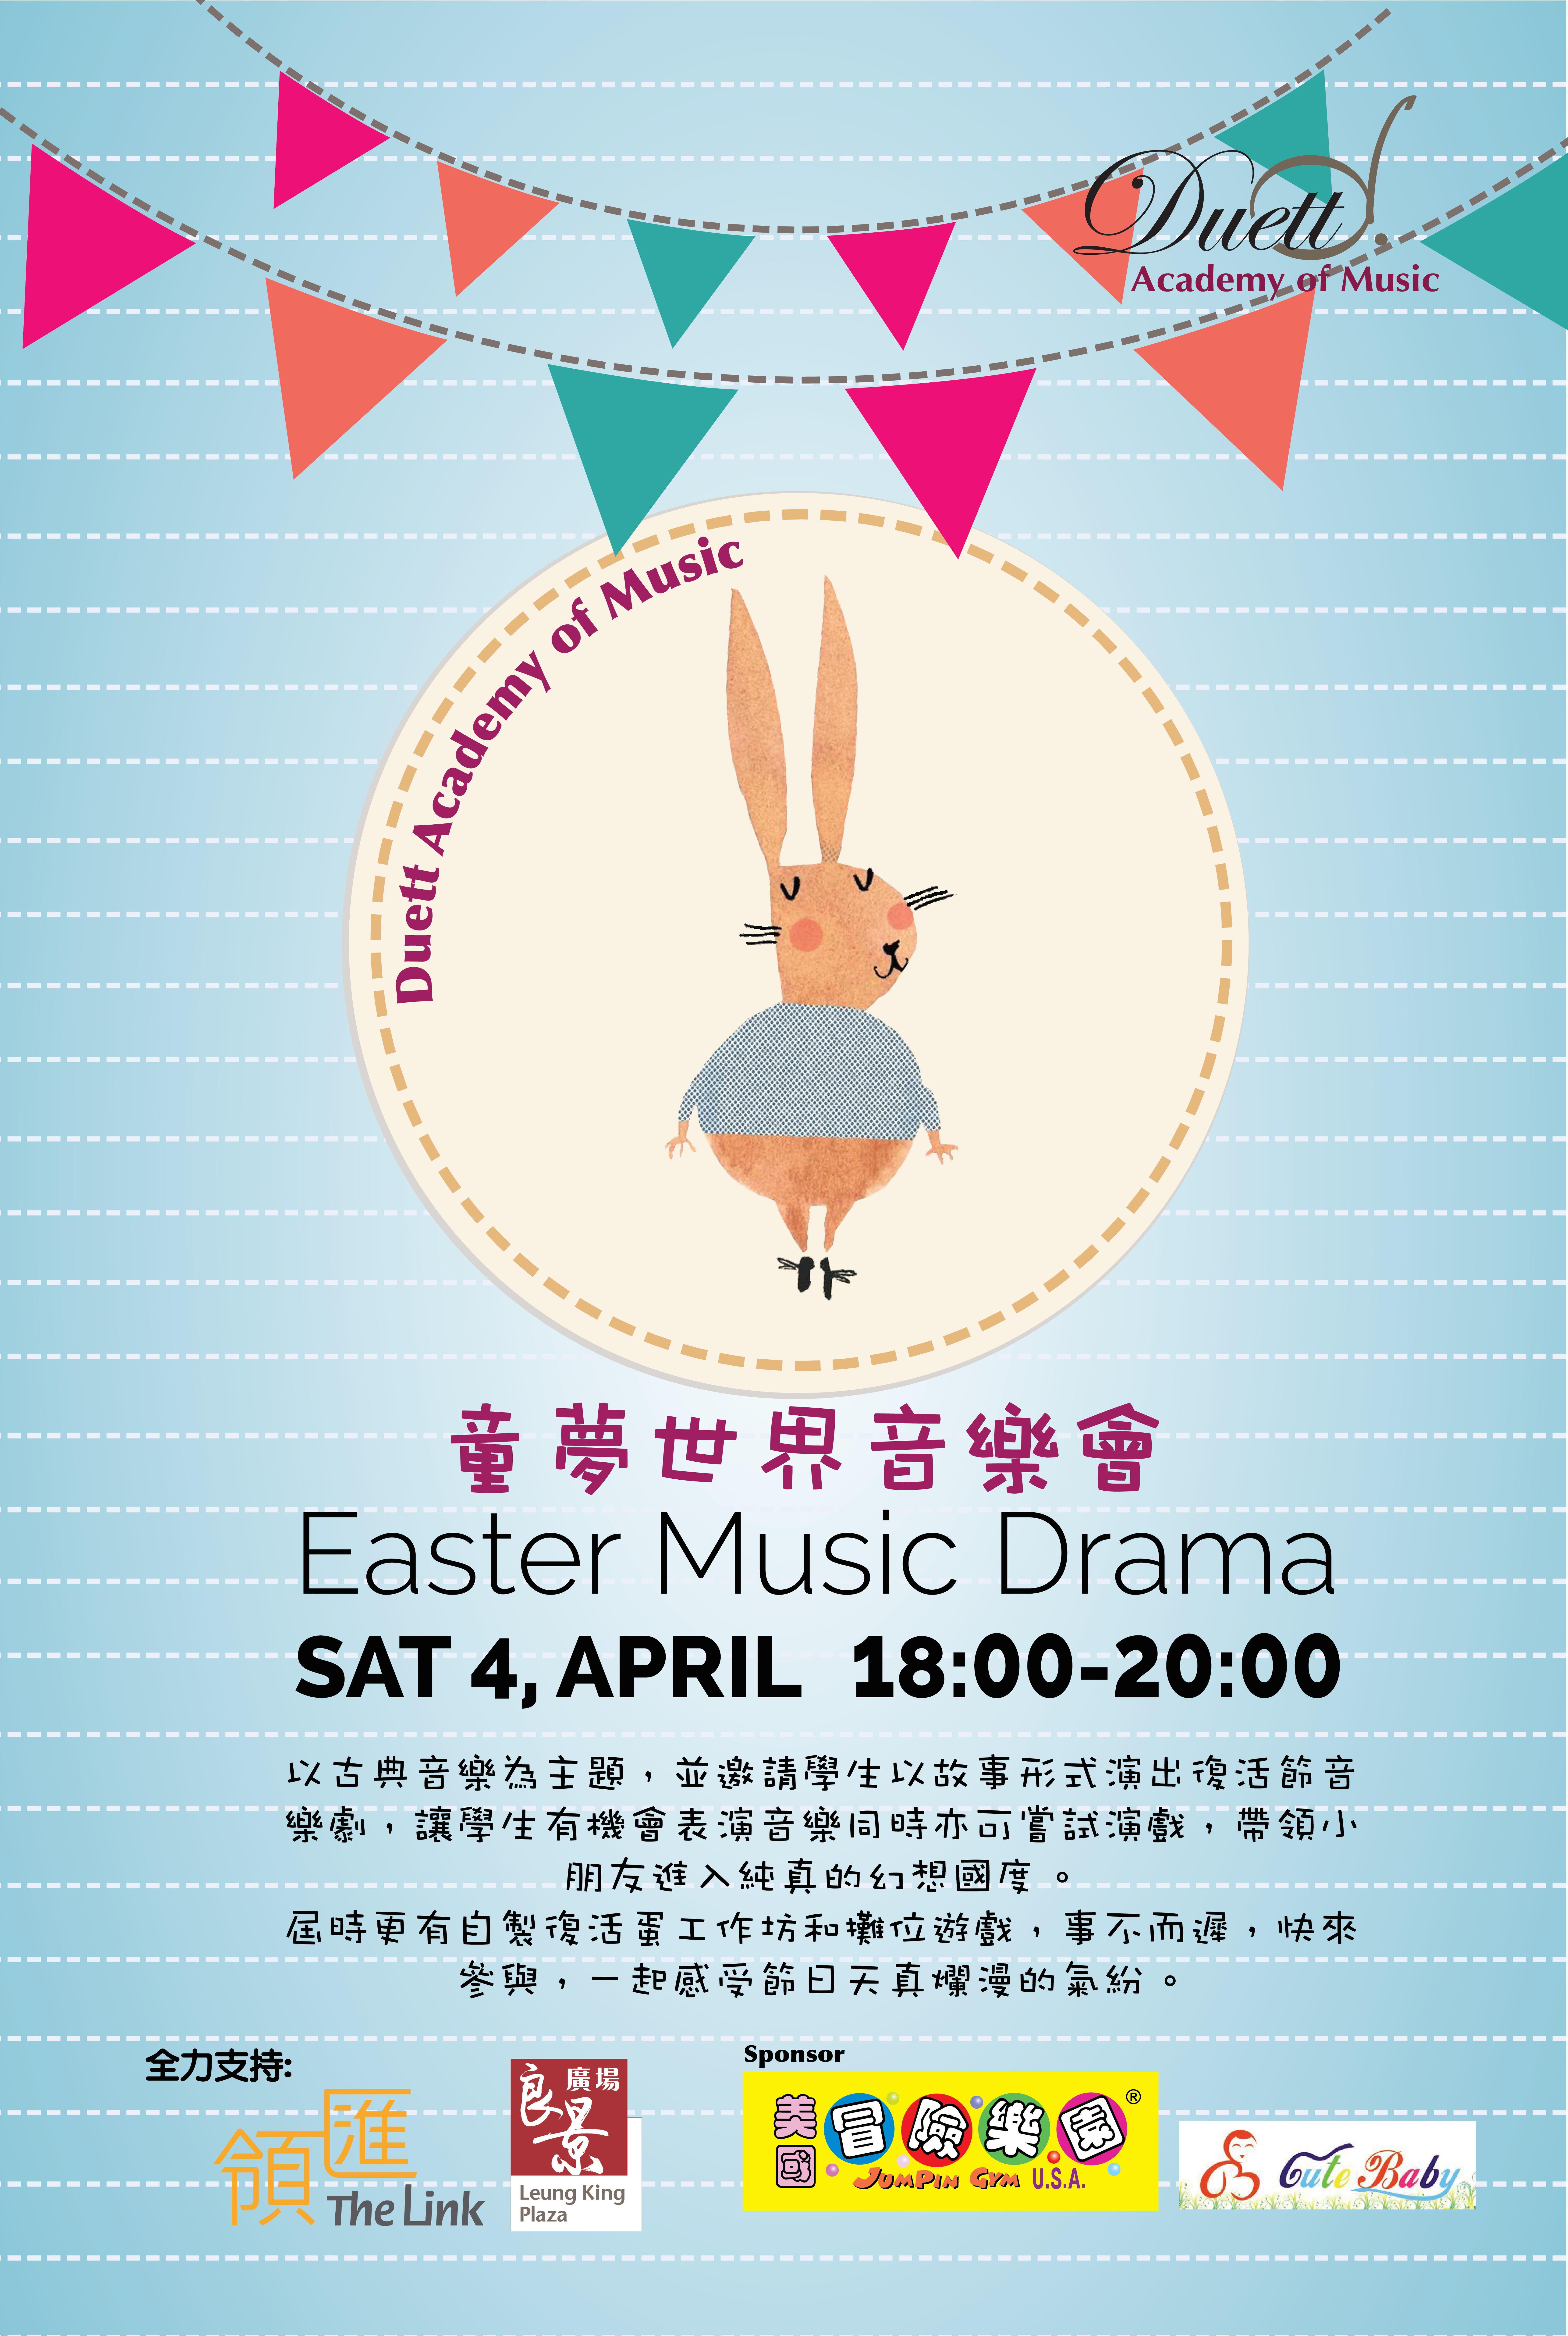 Easter Music Drama 2015